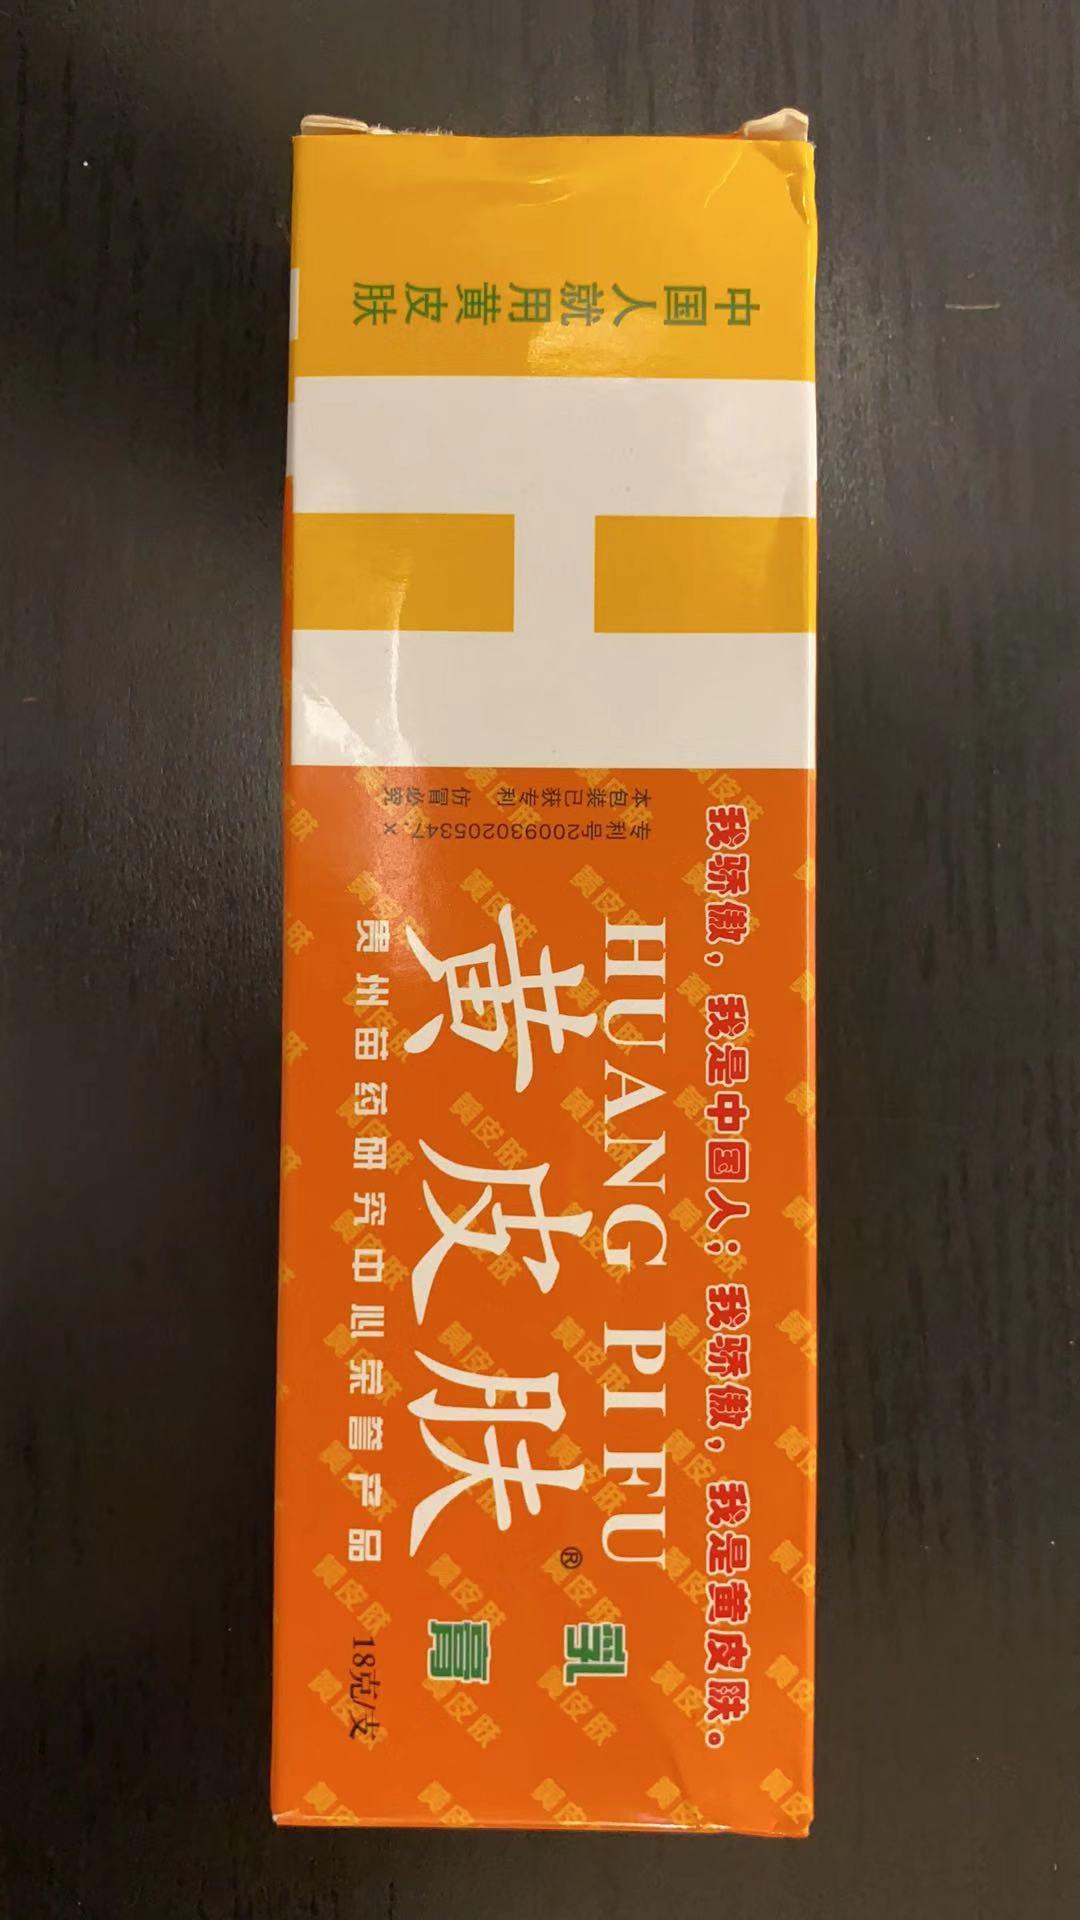 huang pifu kenőcs pikkelysömörhöz)